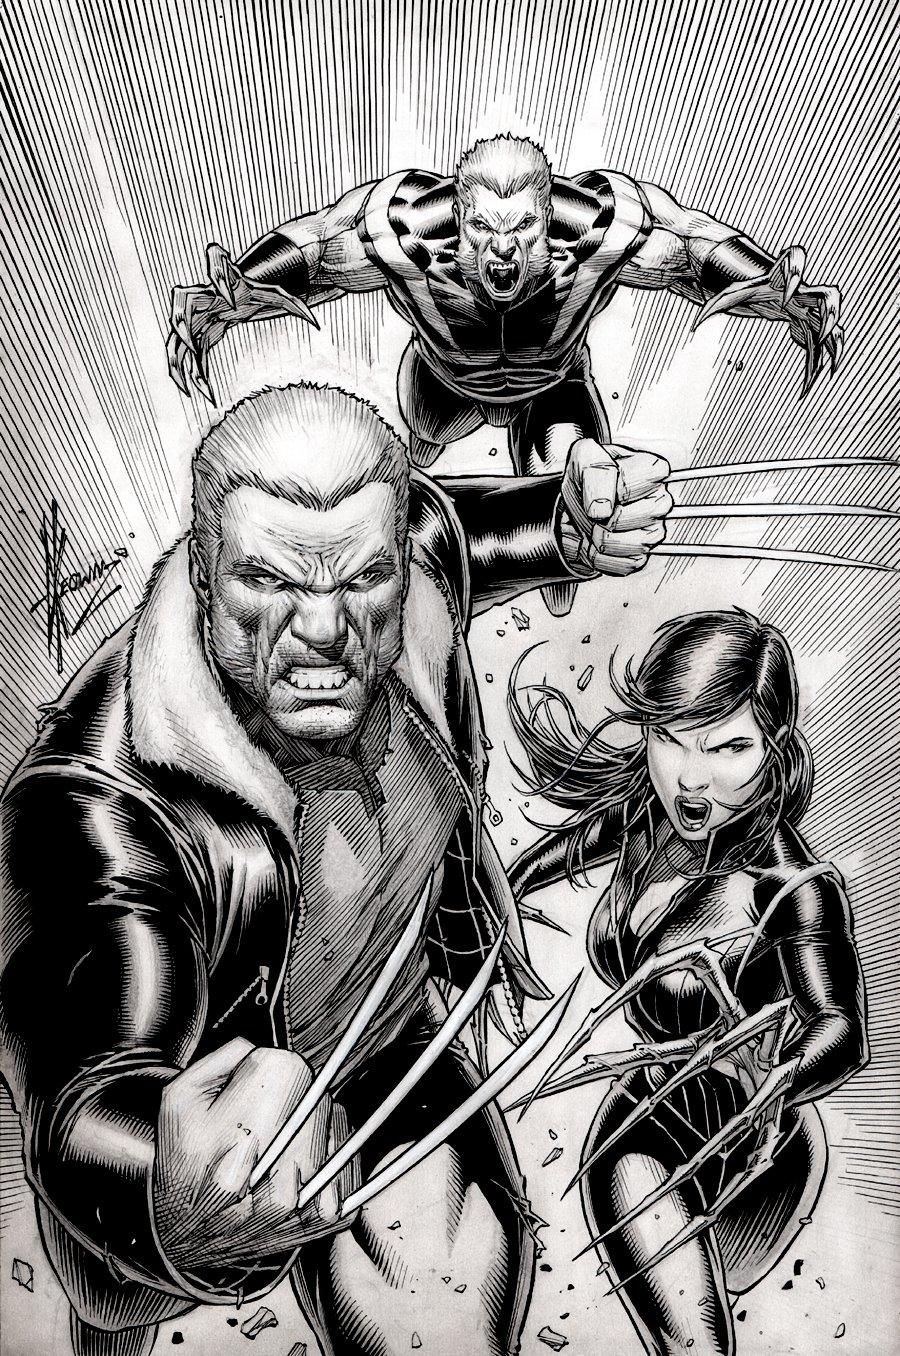 Weapon X #1 Cover (LOGAN, SABRETOOTH, LADY DEATHSTRIKE!) 2017